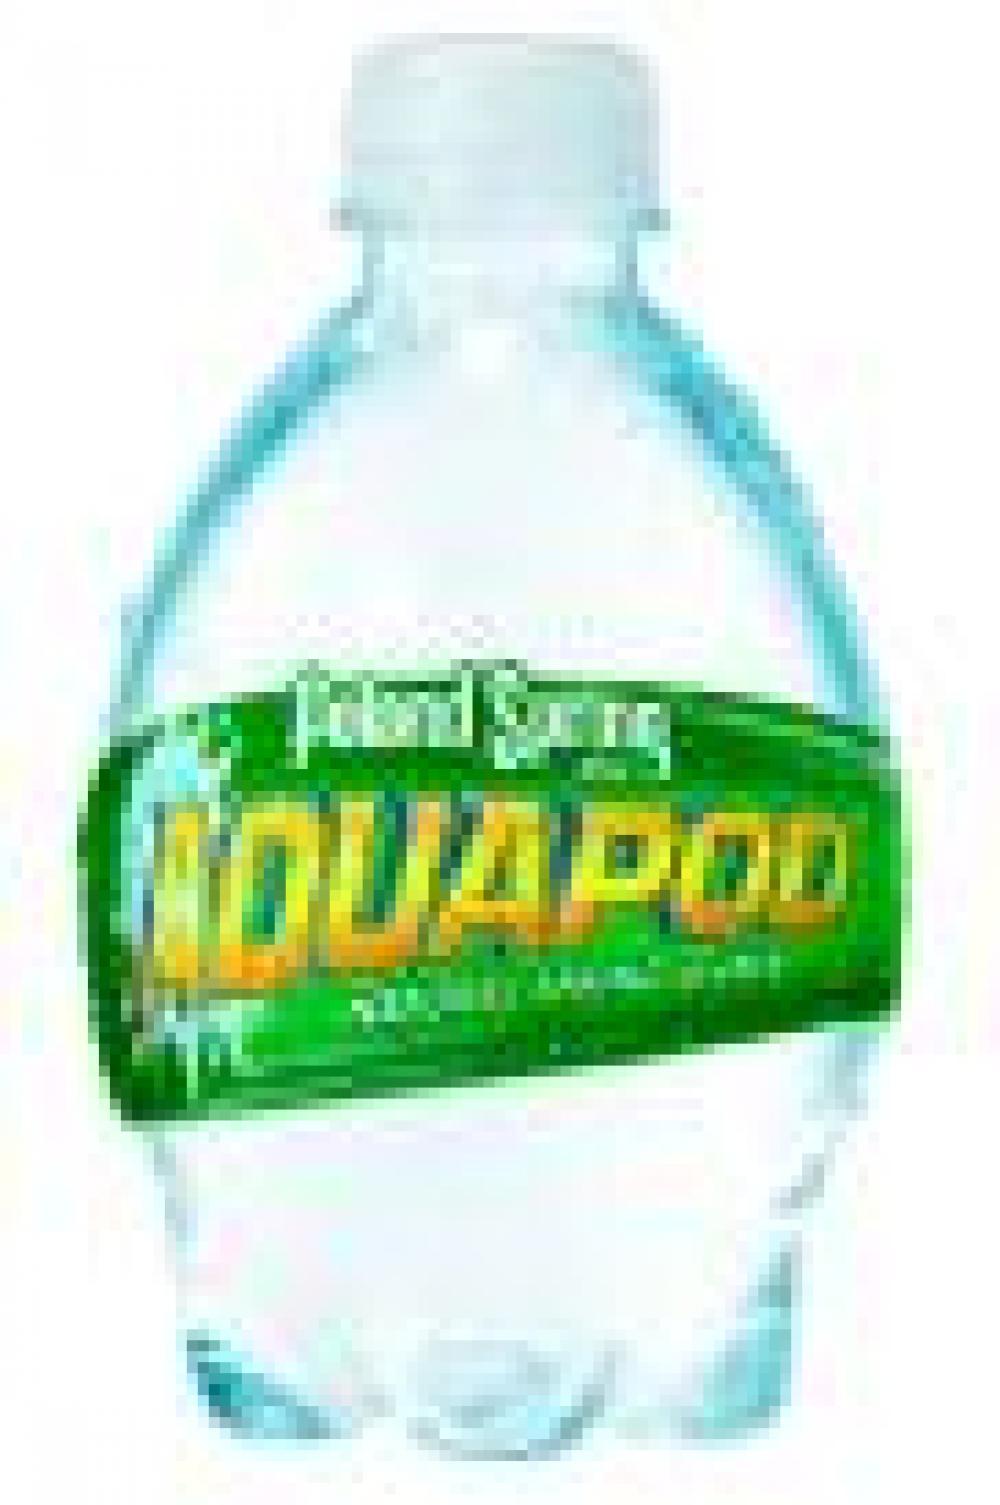 Nestle's Aquapod